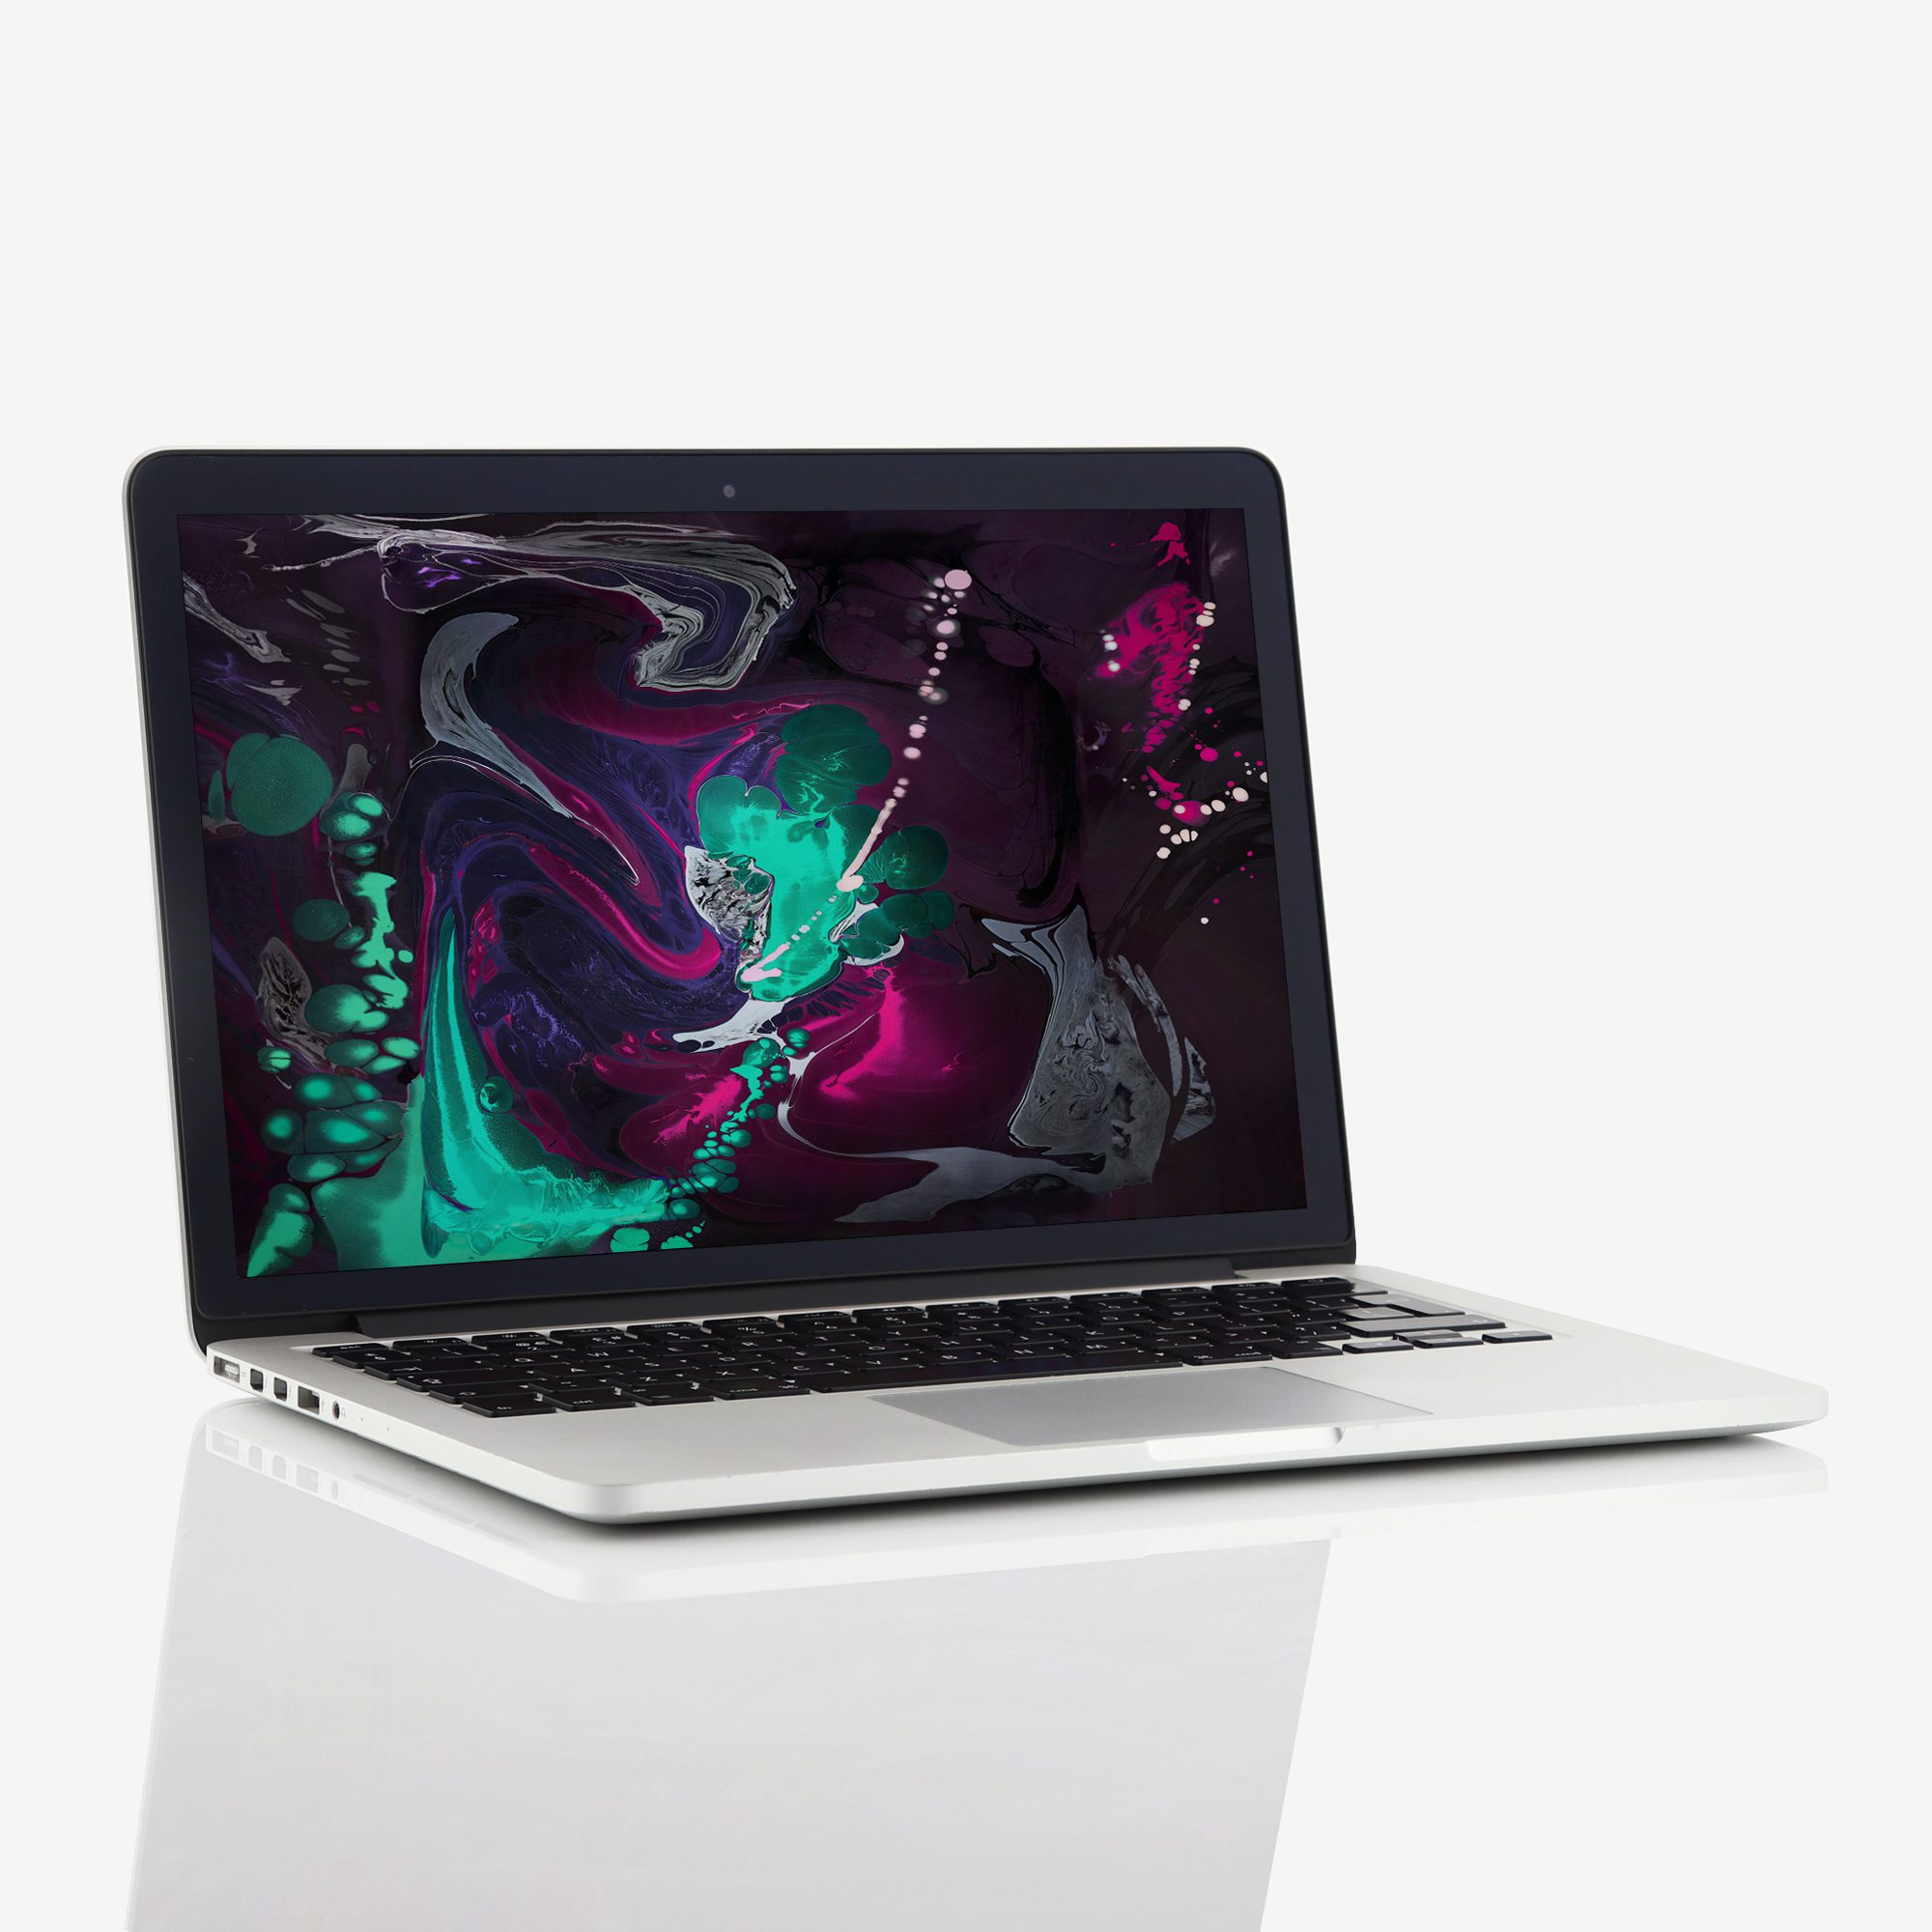 1 x Apple MacBook Pro Retina 13 Inch Intel Core i5 2.90 GHz (2015)